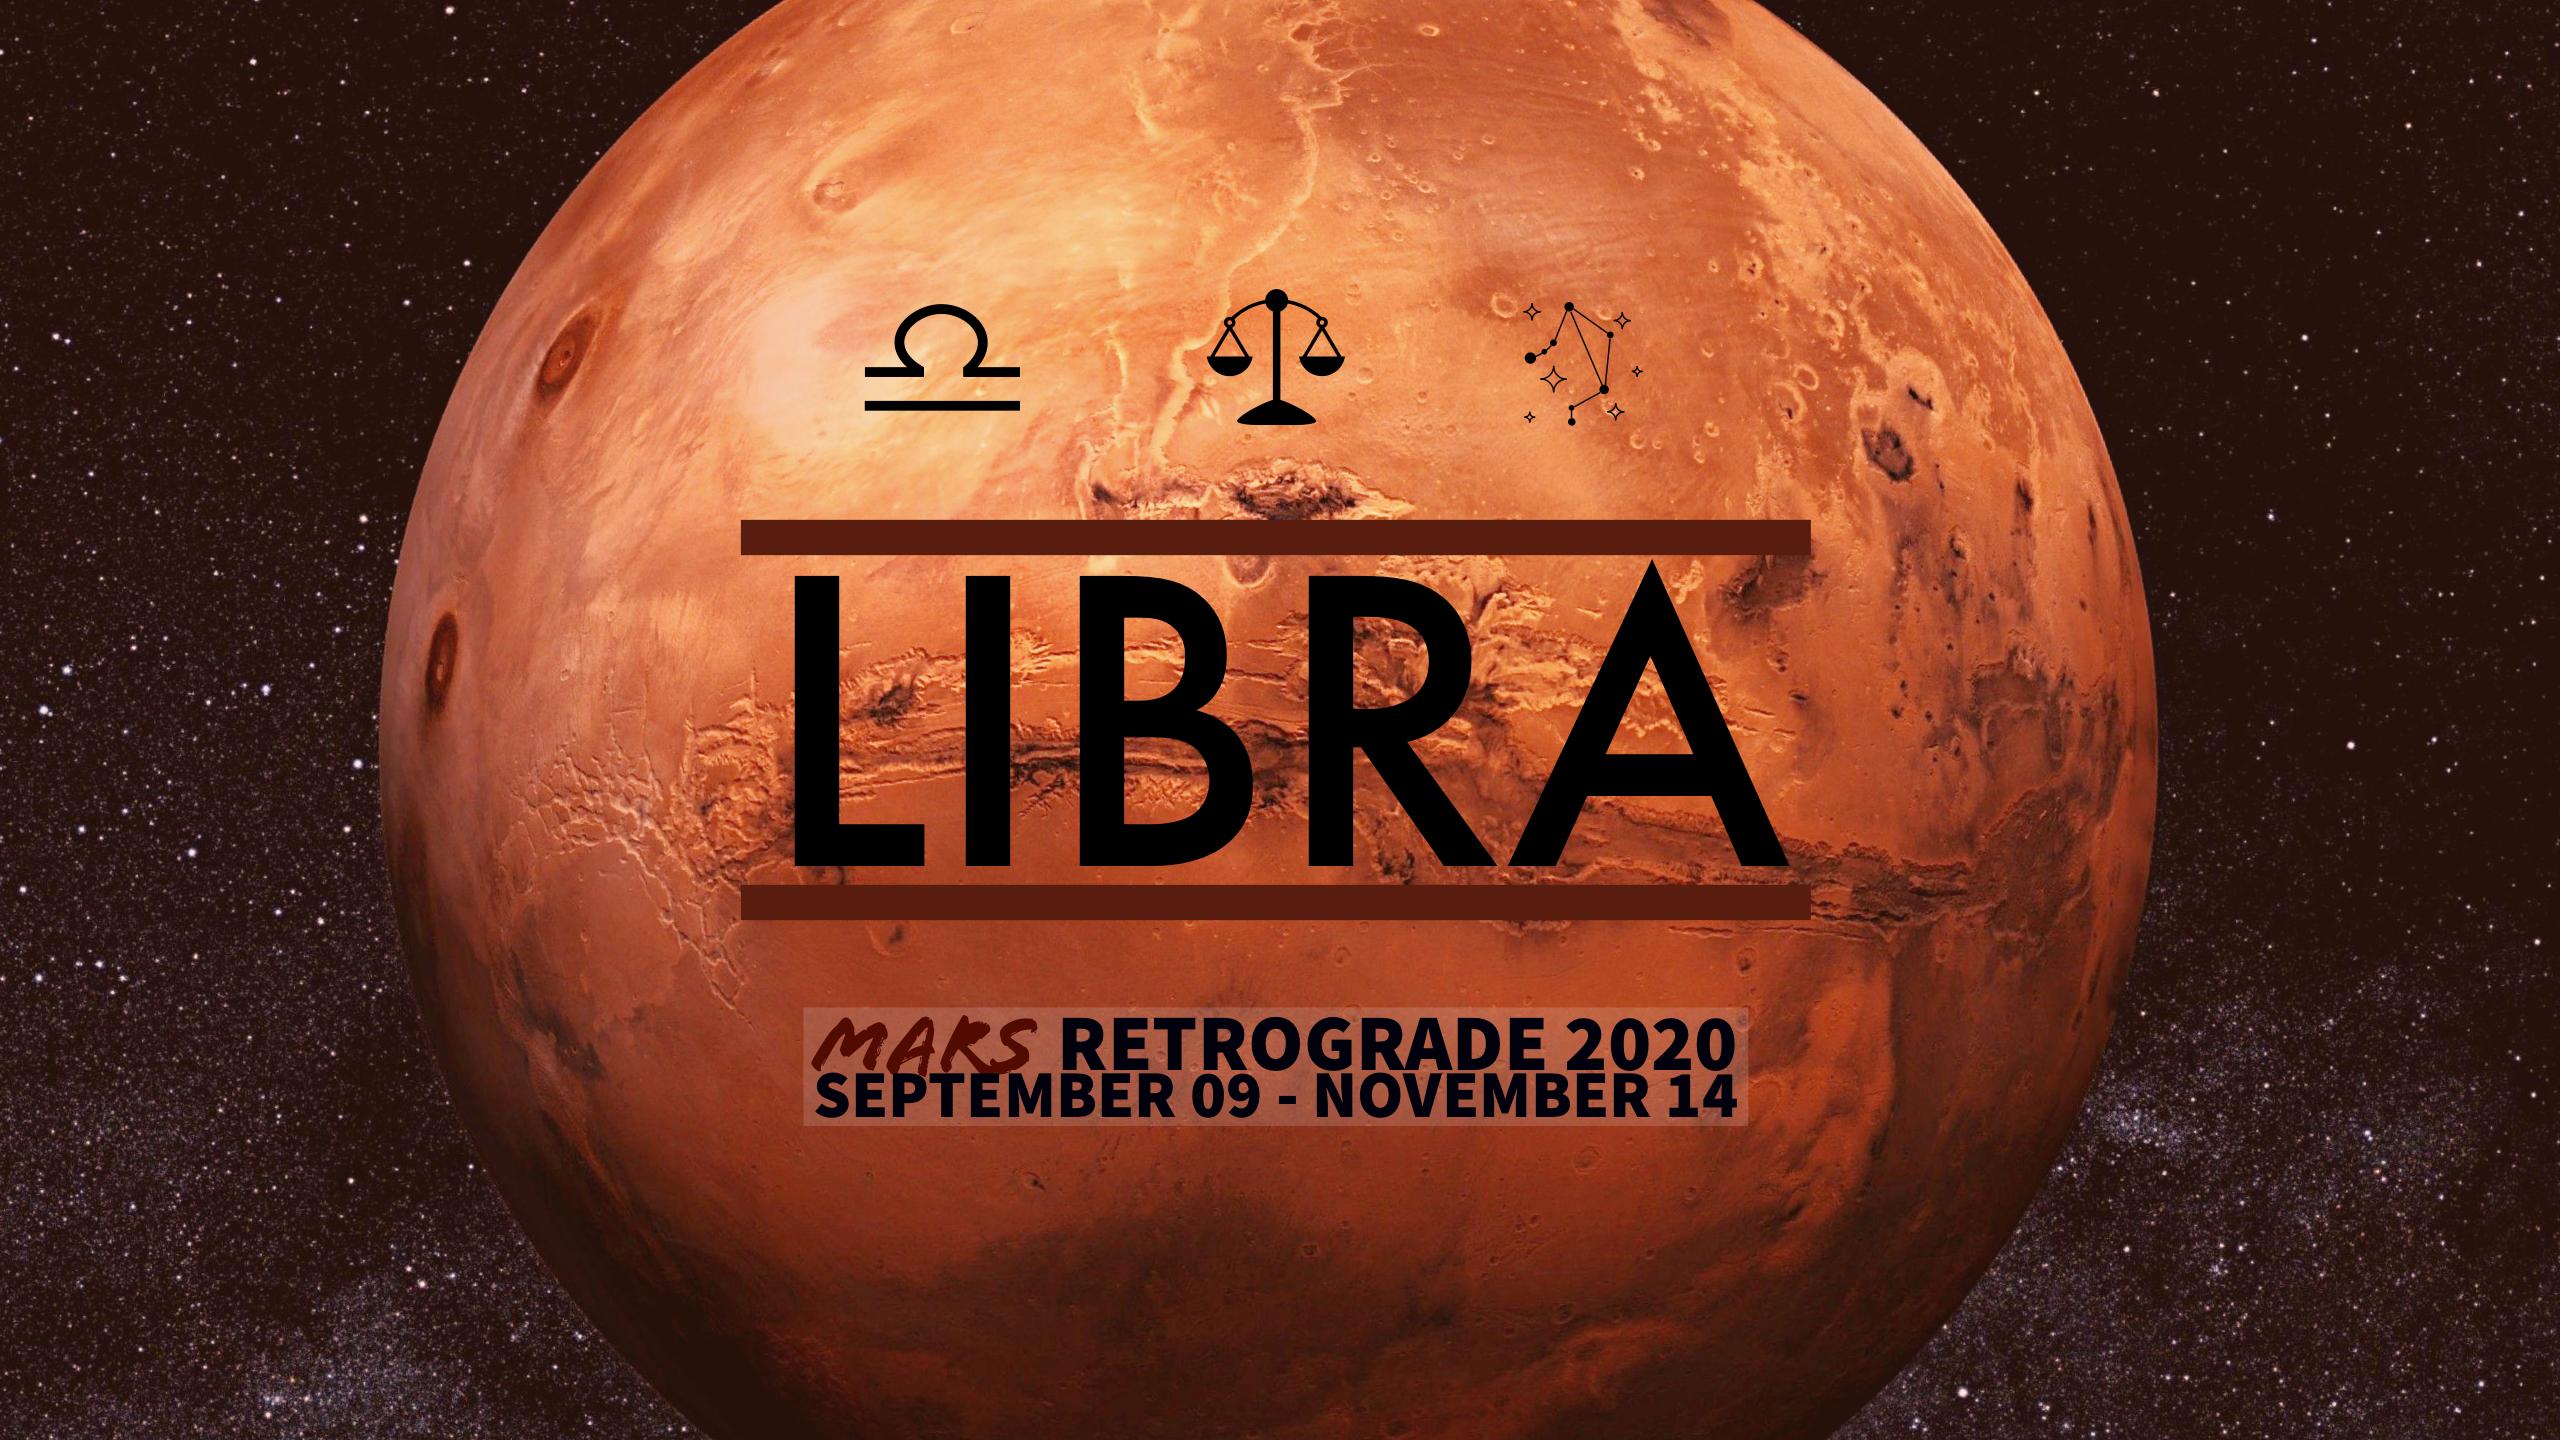 2020 Mars Retrograde:07 Libra